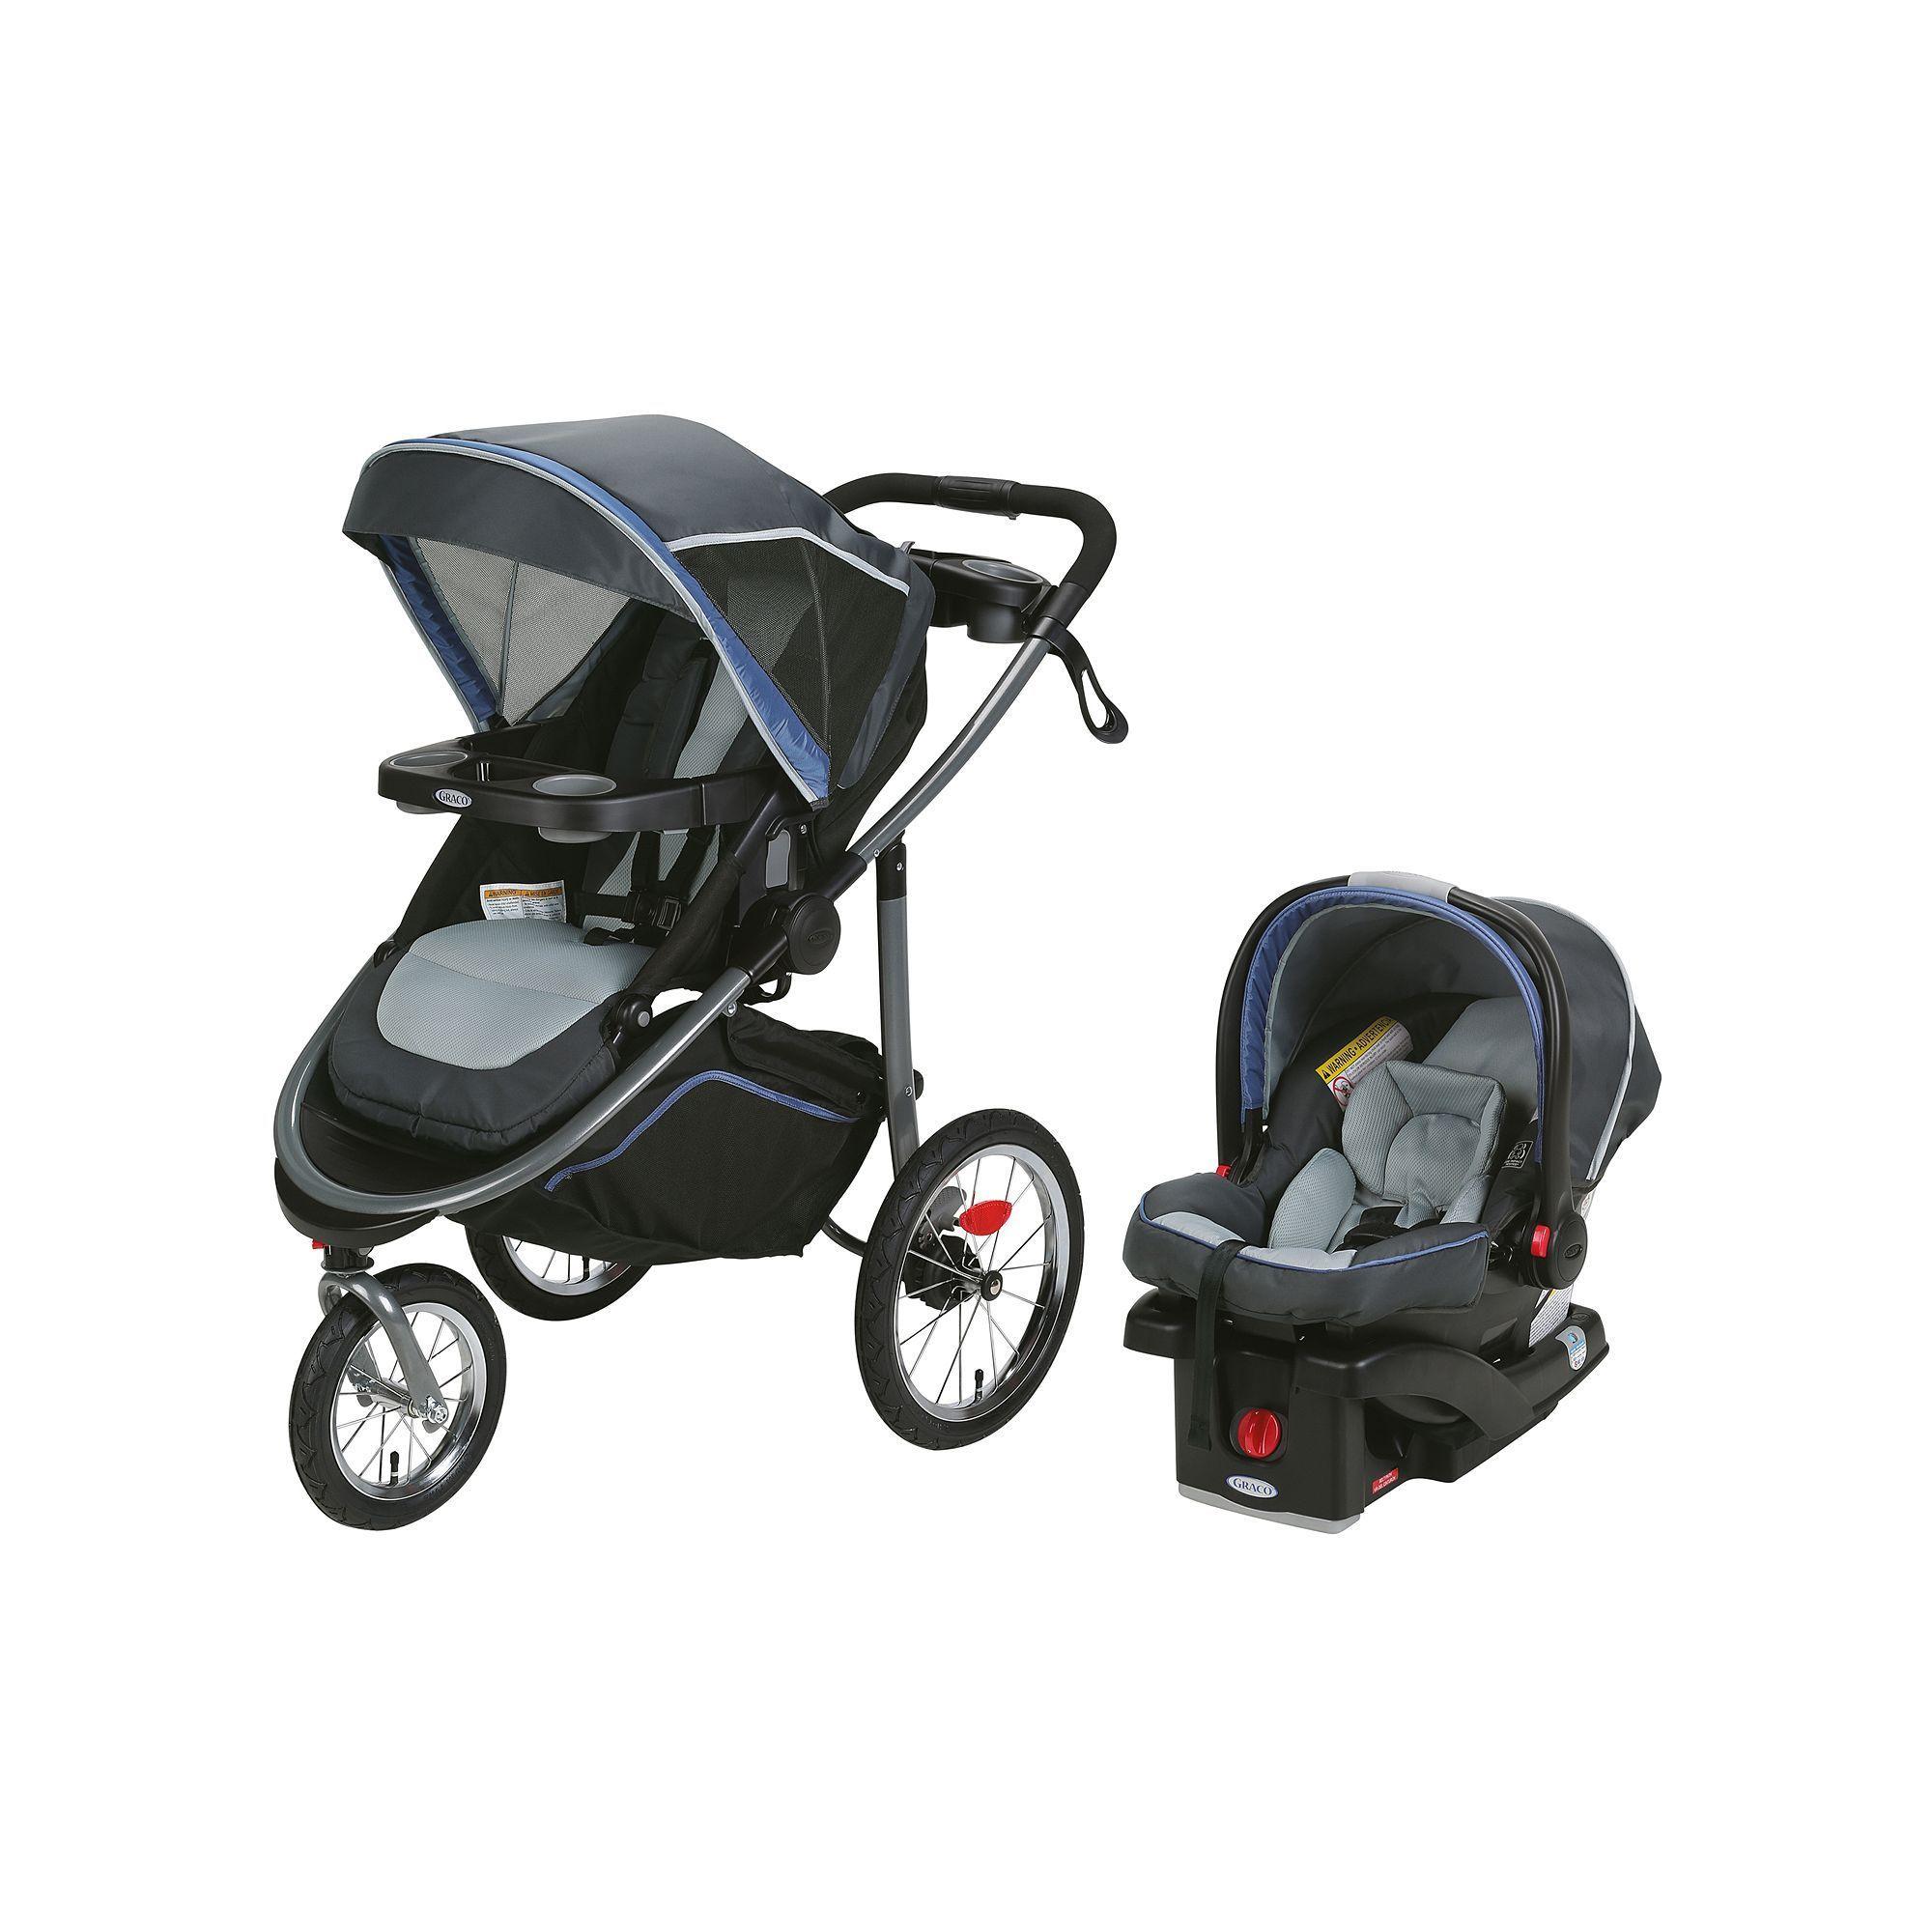 Graco Modes Jogger Stroller Travel System, Blue